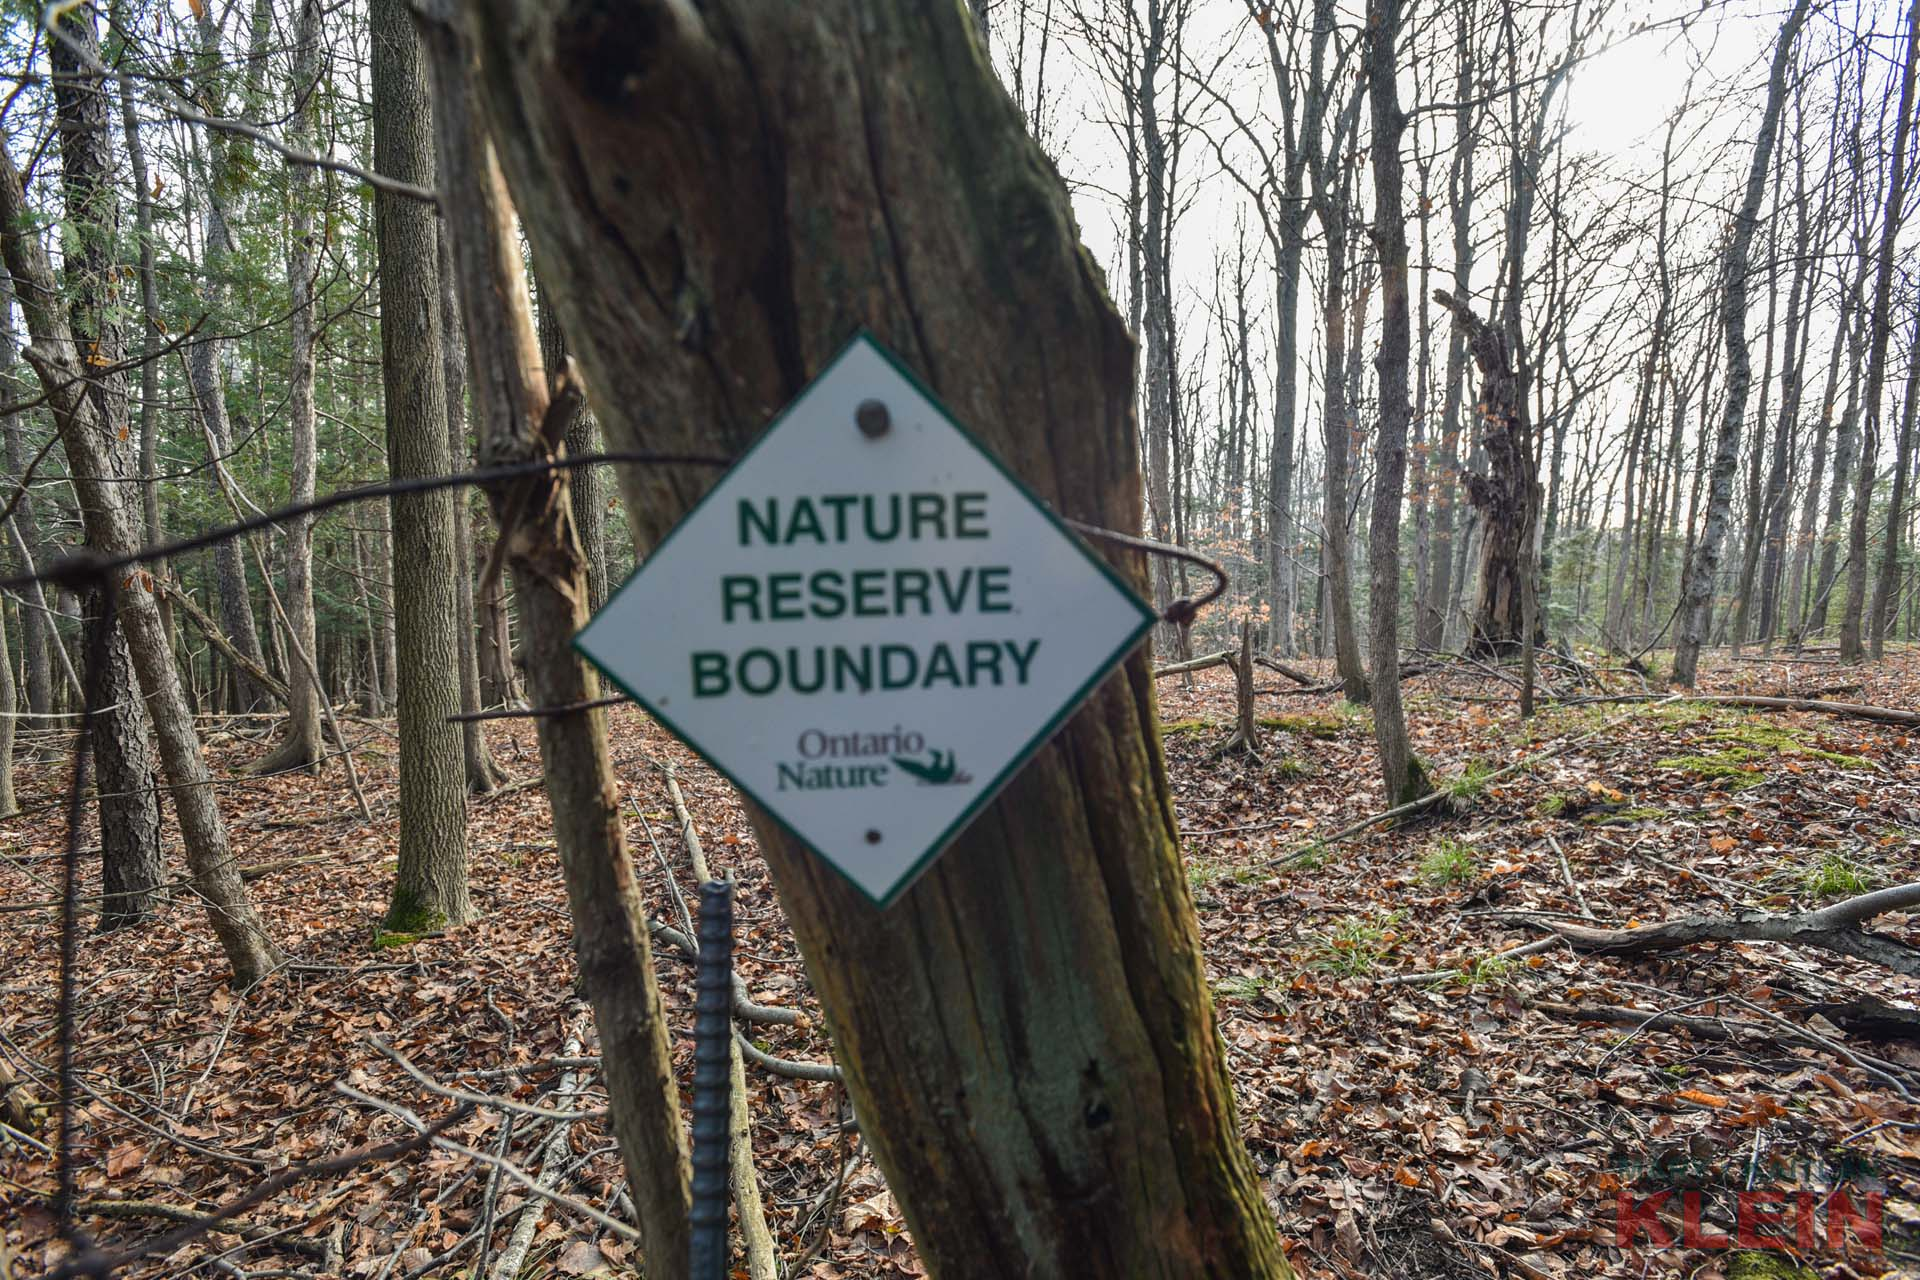 Ontario Nature Reserve Boundary